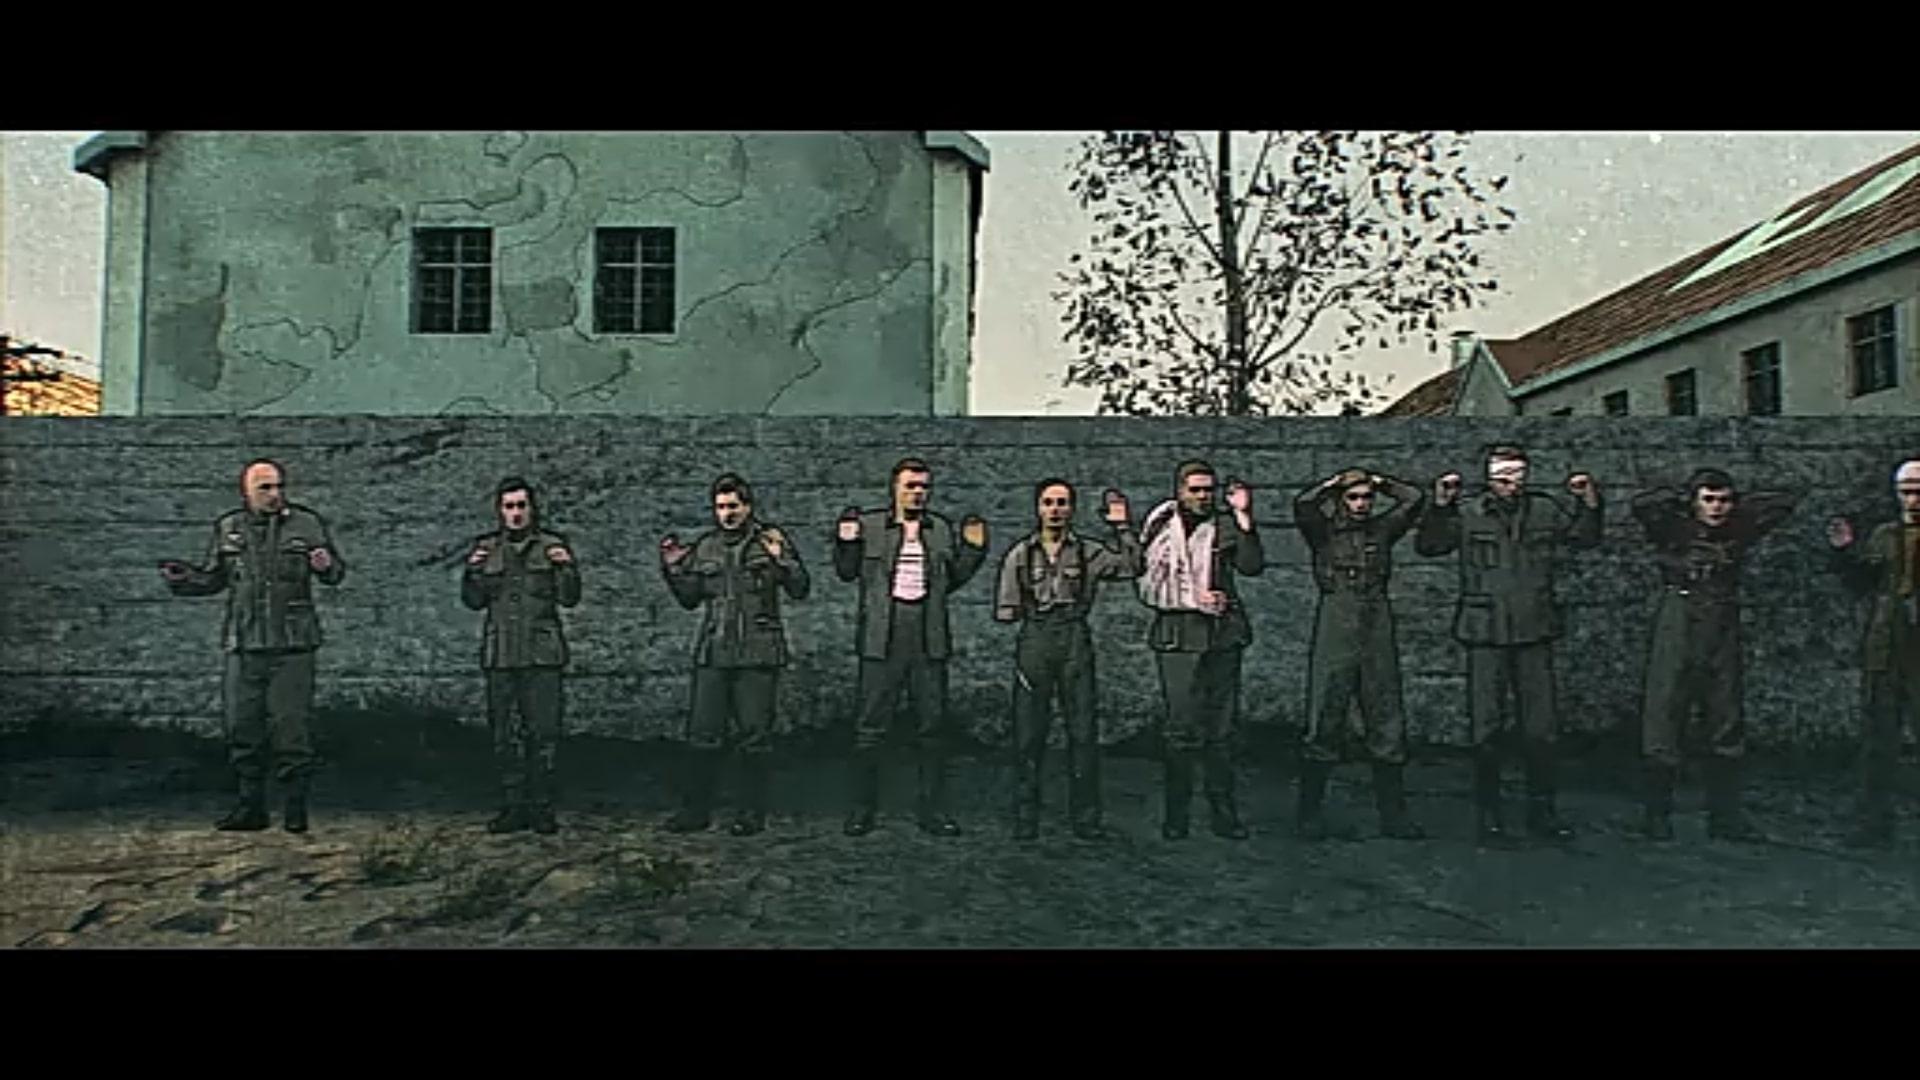 El final del Libertador, explicado | Sinopsis de la trama de Netflix 3